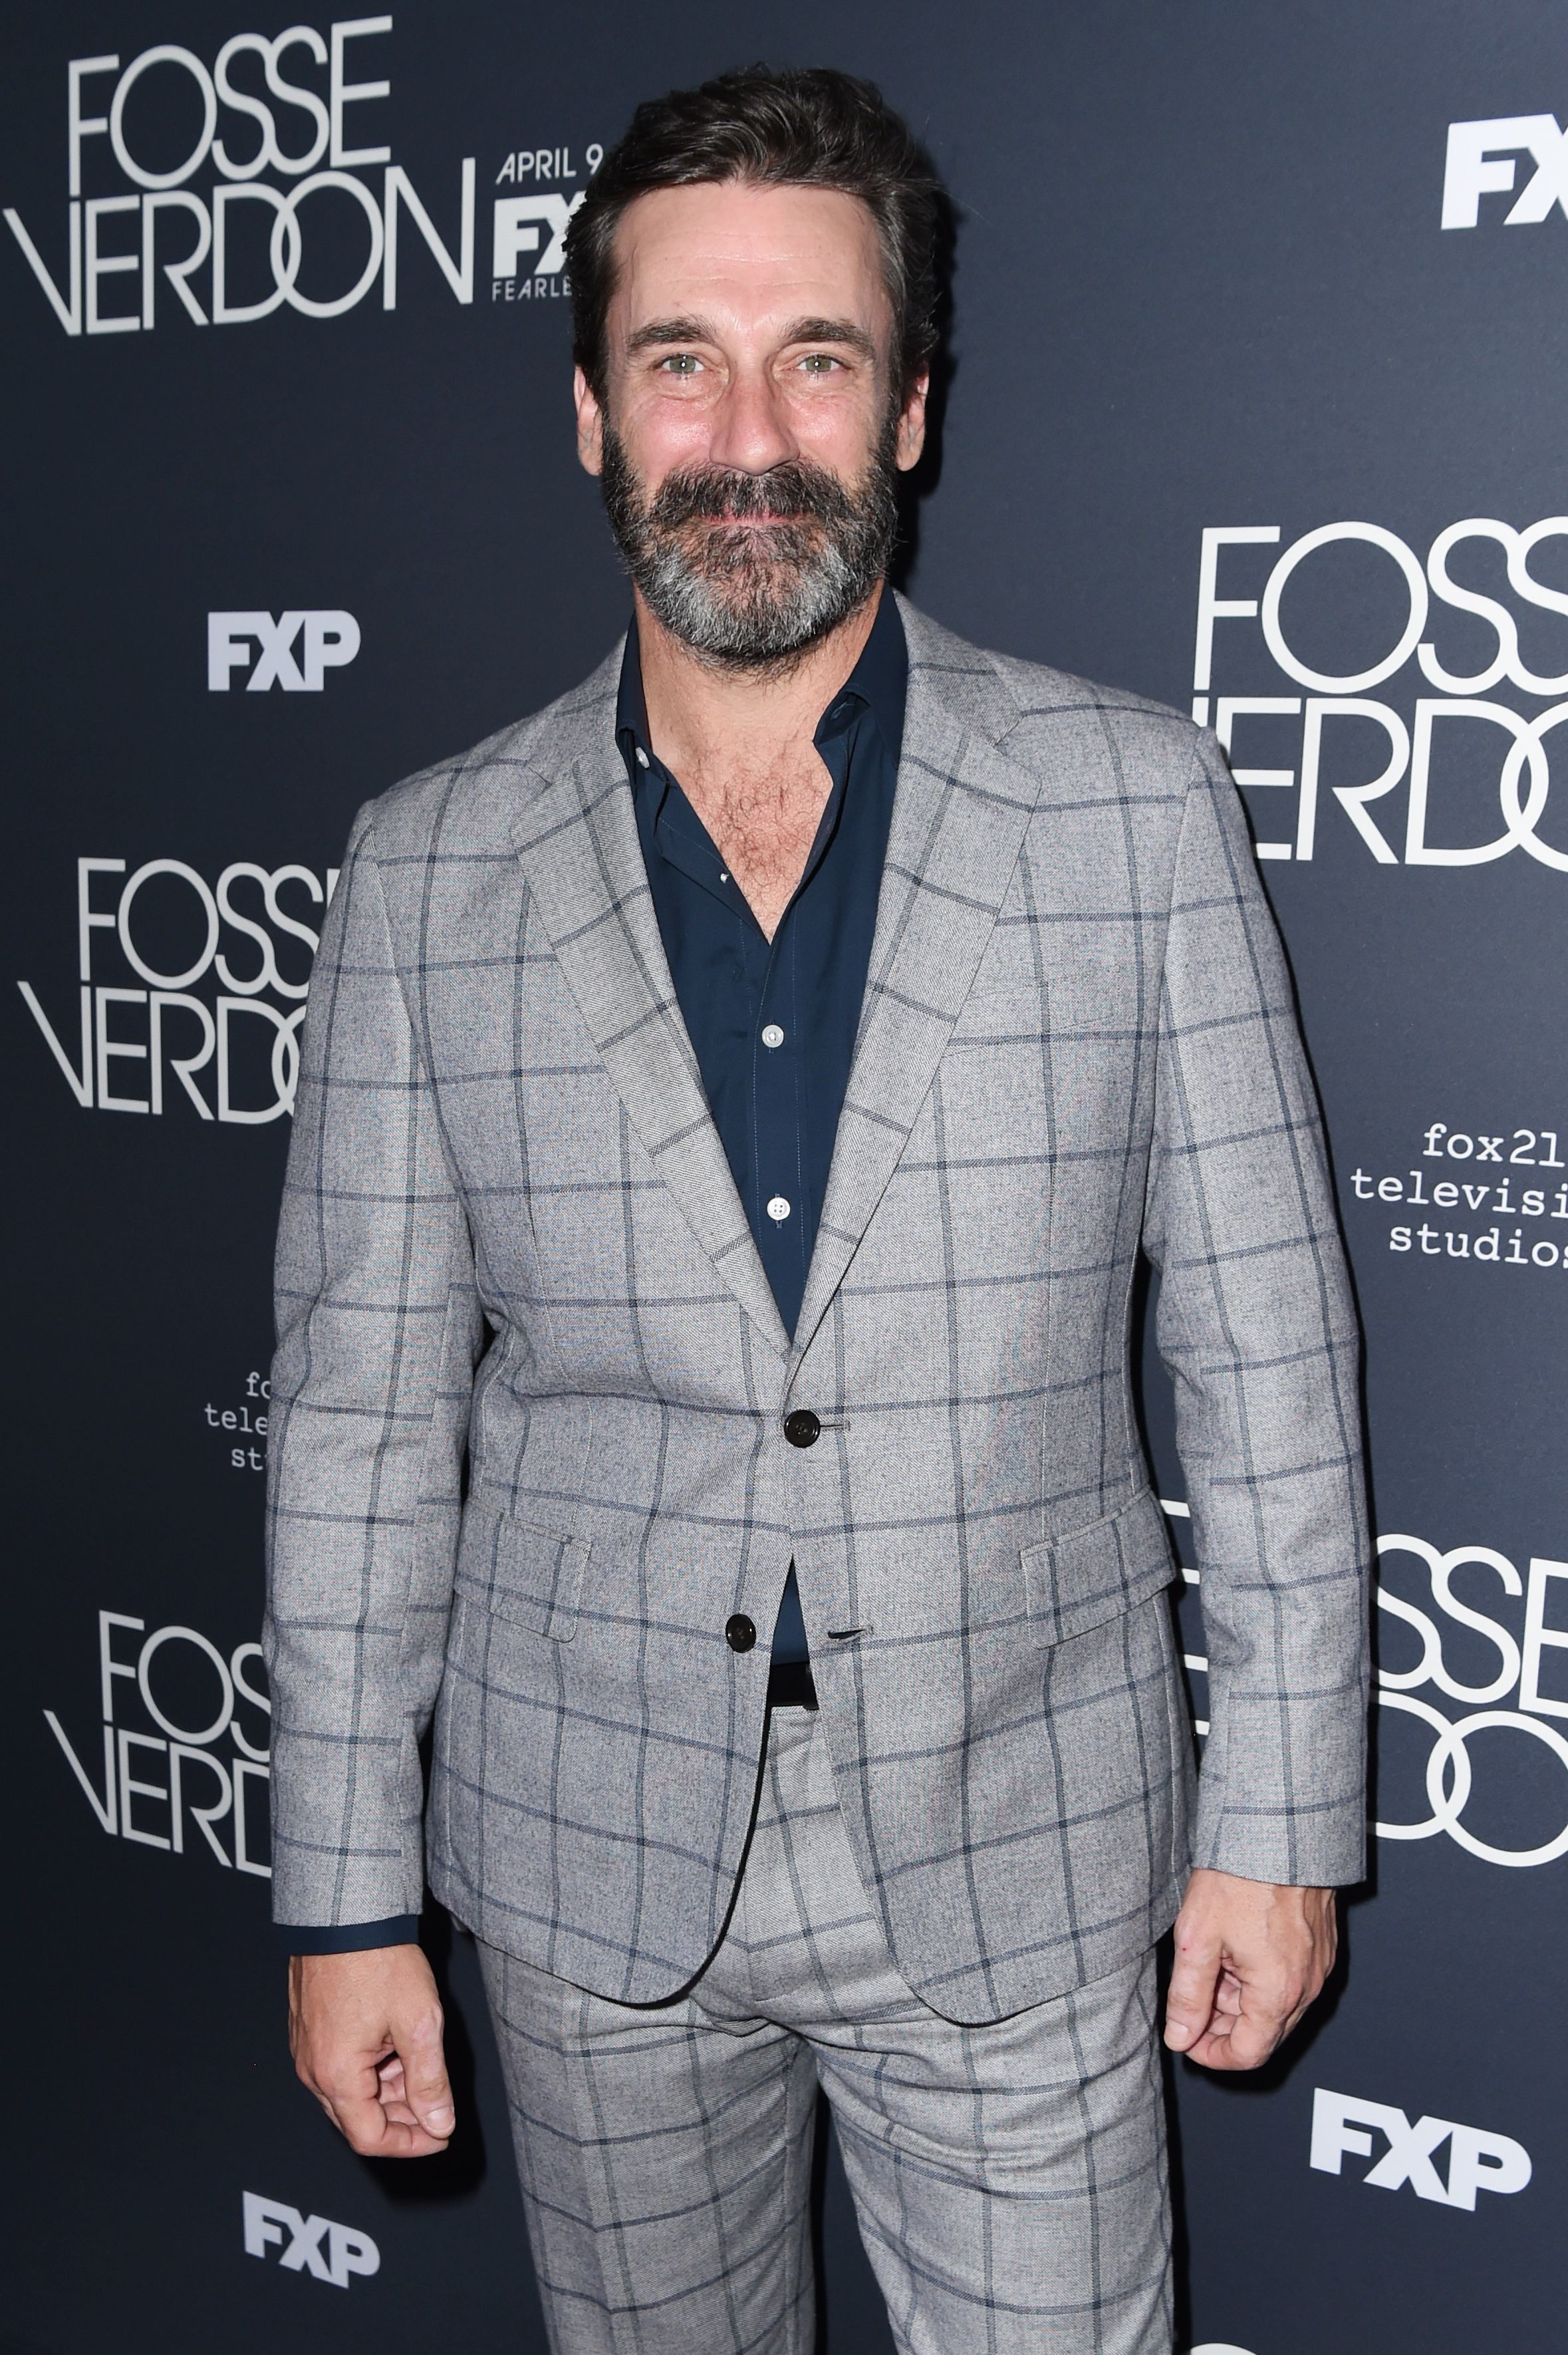 "Jon Hamm attends the ""Fosse/Verdon"" TV show premiere in New York City on April 8, 2019."